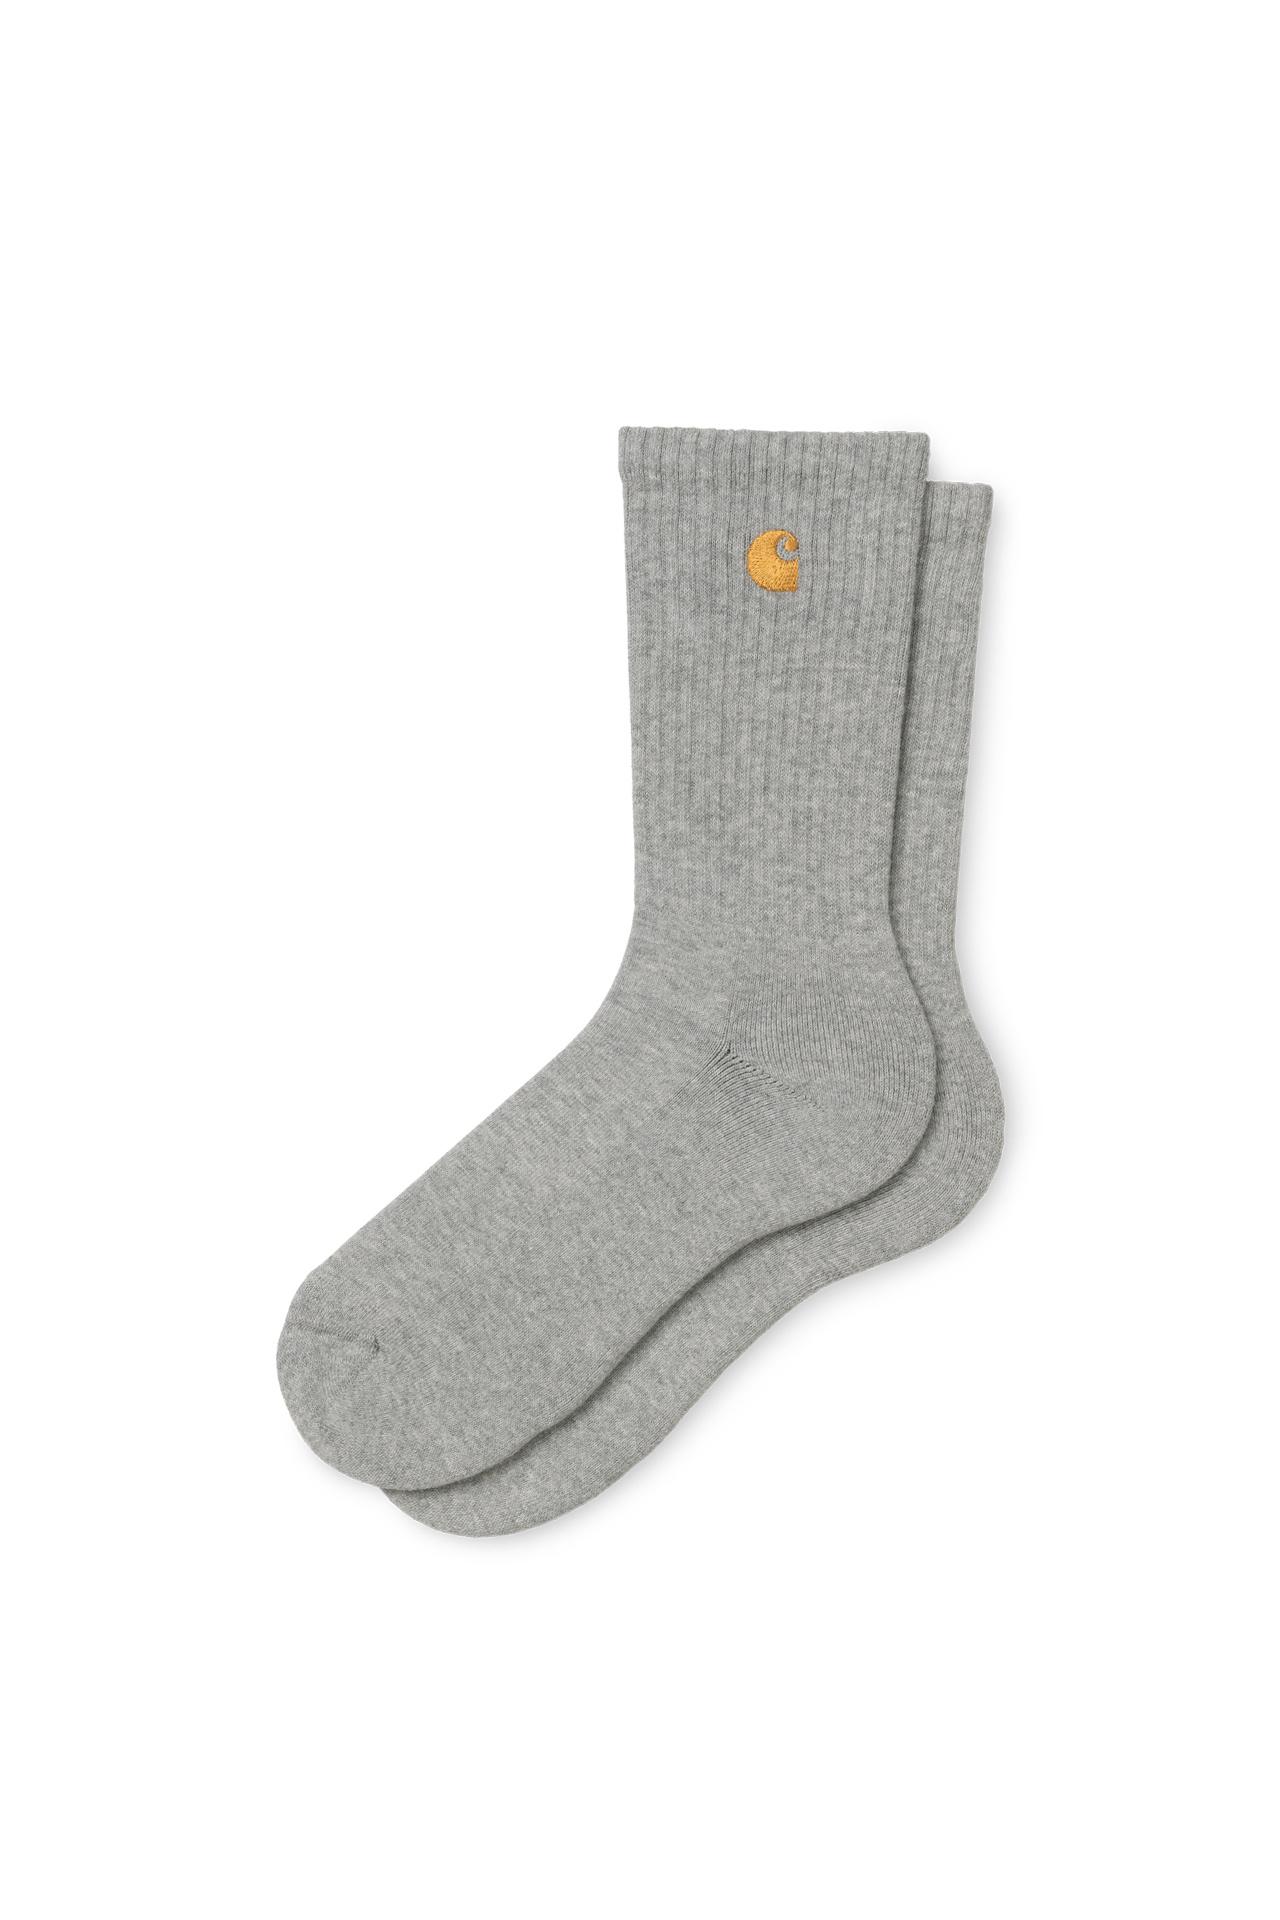 Foto van Carhartt Sokken Chase Socks Grey Heather / Gold I026527